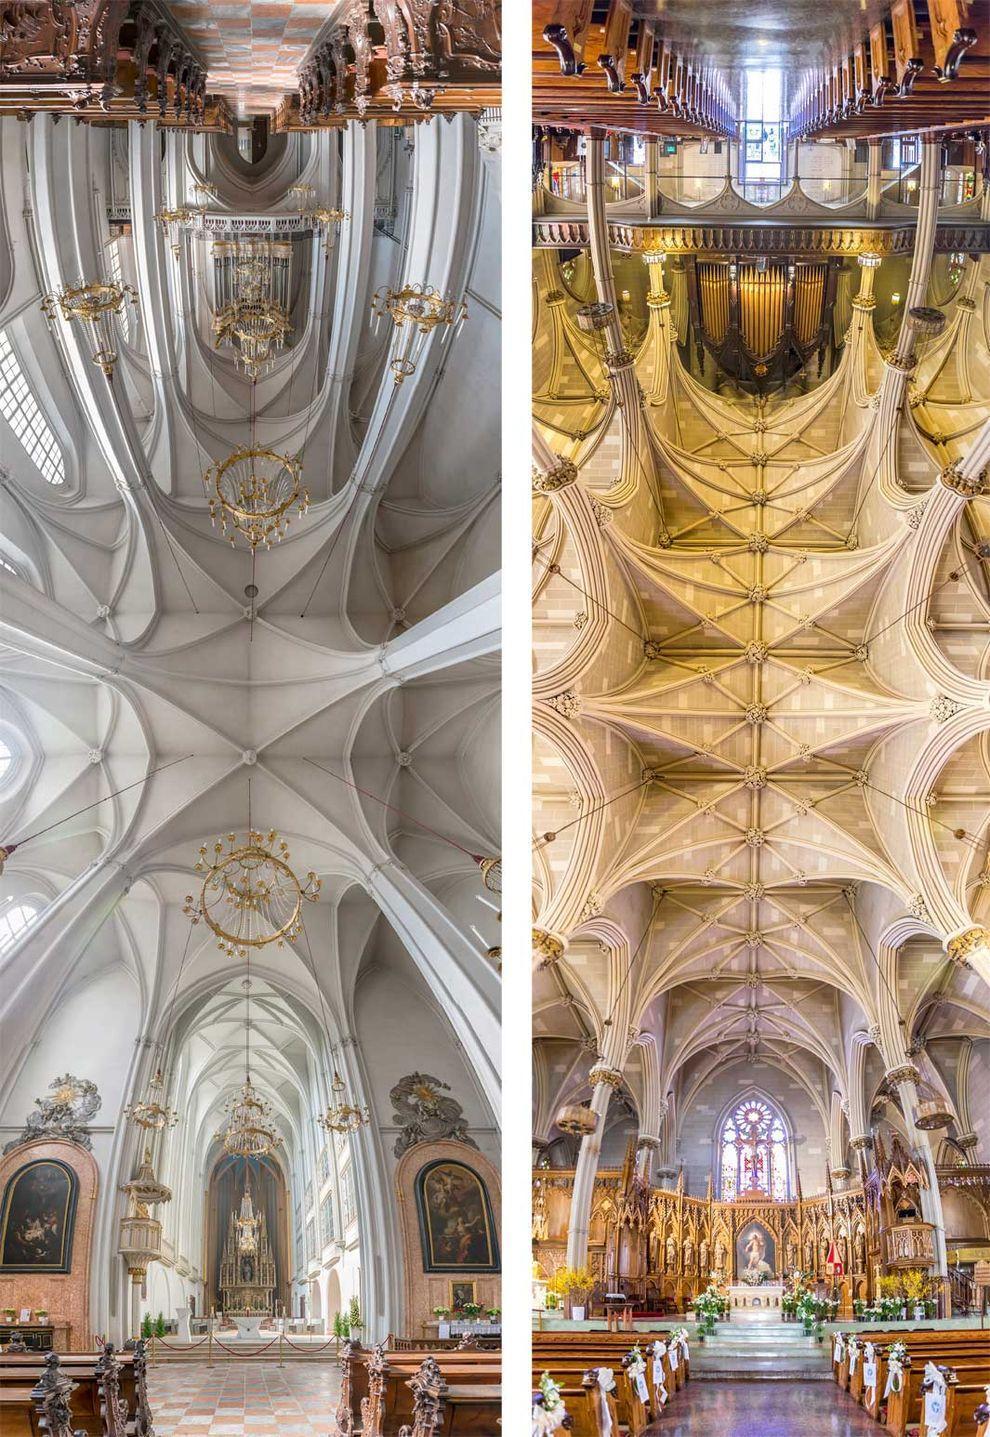 Church03 Потрясающие снимки храмов от входа до алтаря в одном фото